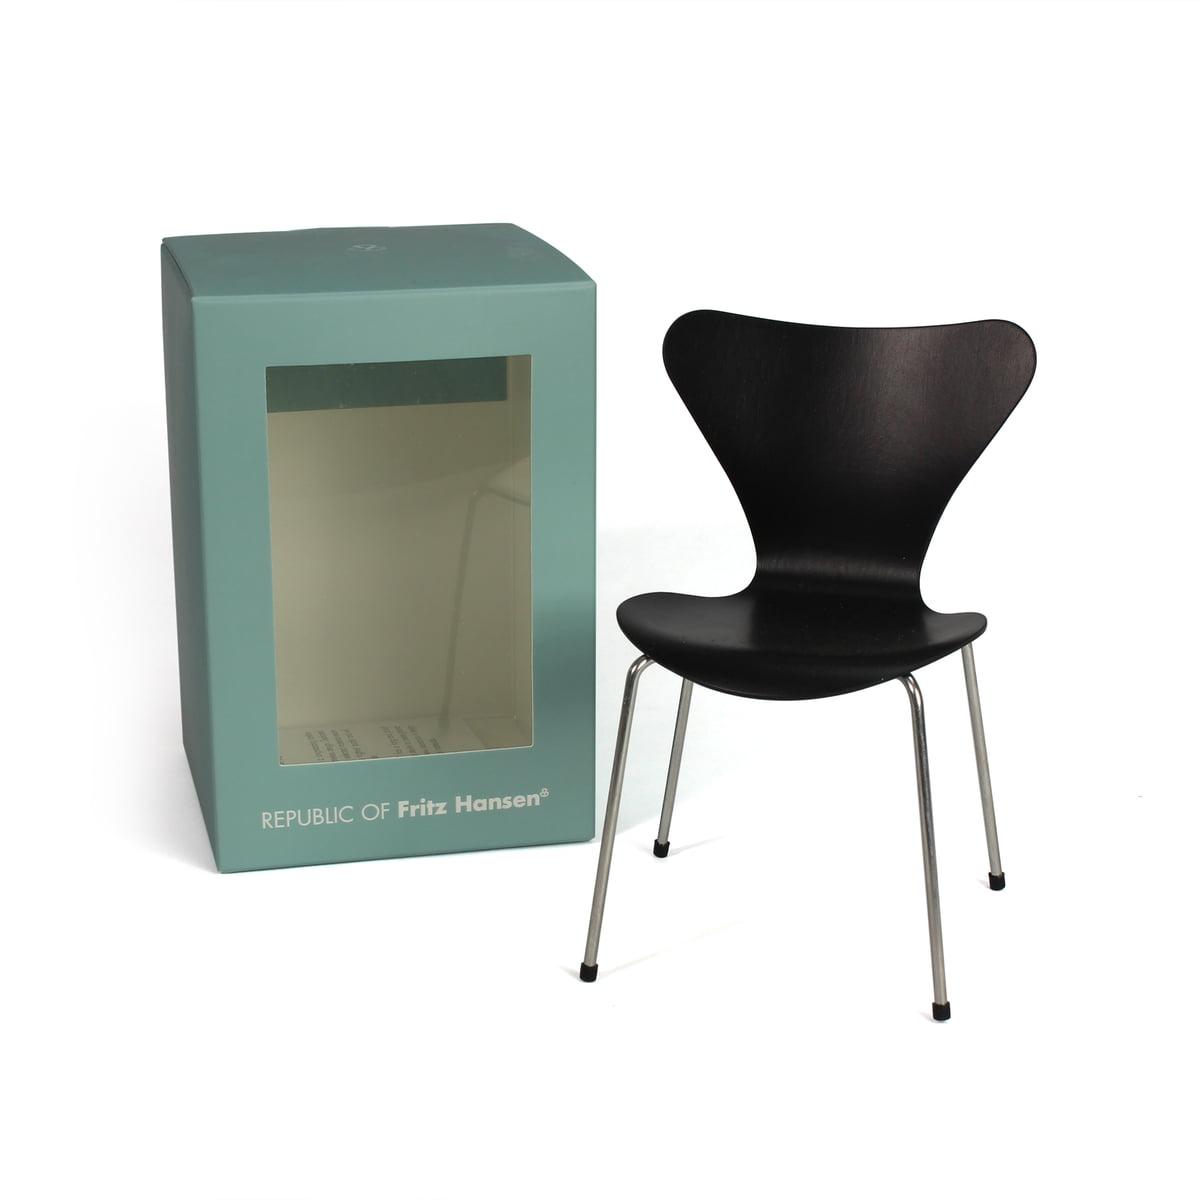 miniature series 7 chair by fritz hansen connox. Black Bedroom Furniture Sets. Home Design Ideas